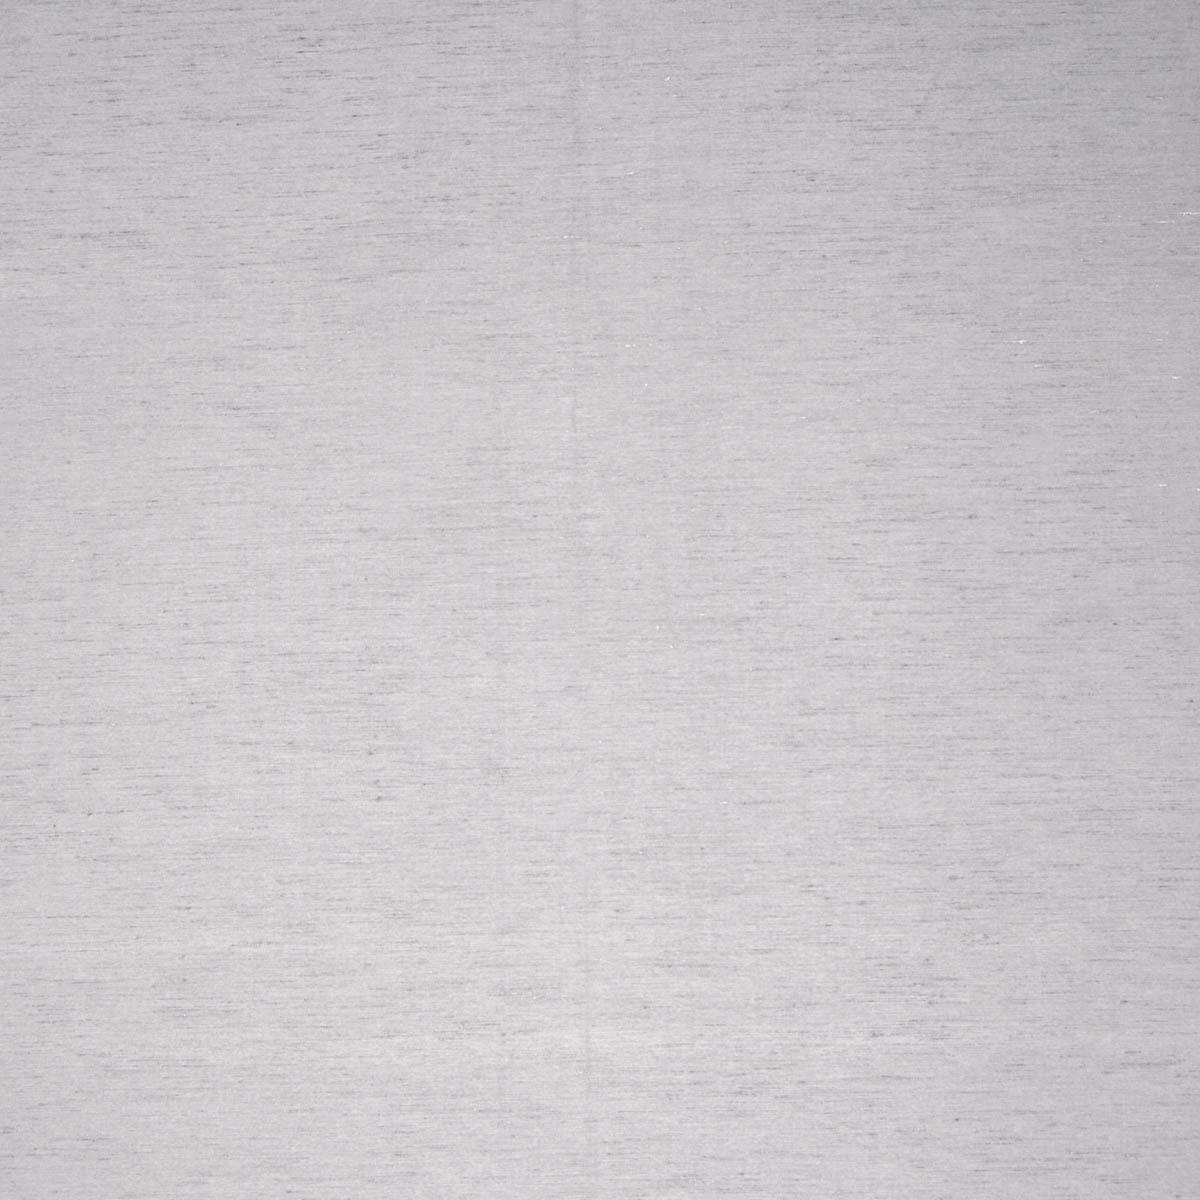 Silky Curtain Fabric Silver Cheap Silky Curtain Fabric